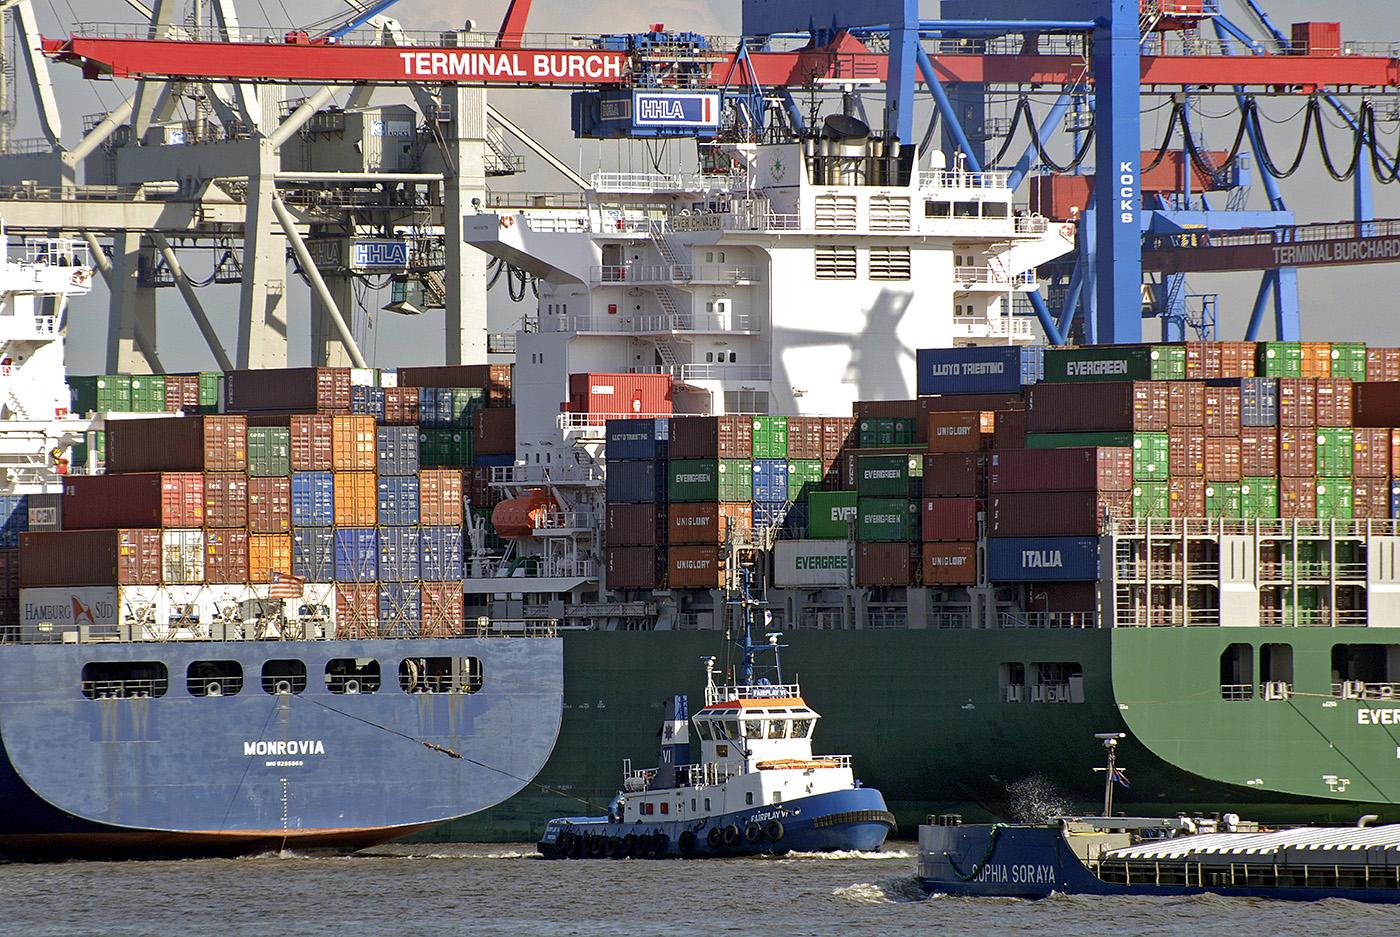 Container-Terminal Burchardkai